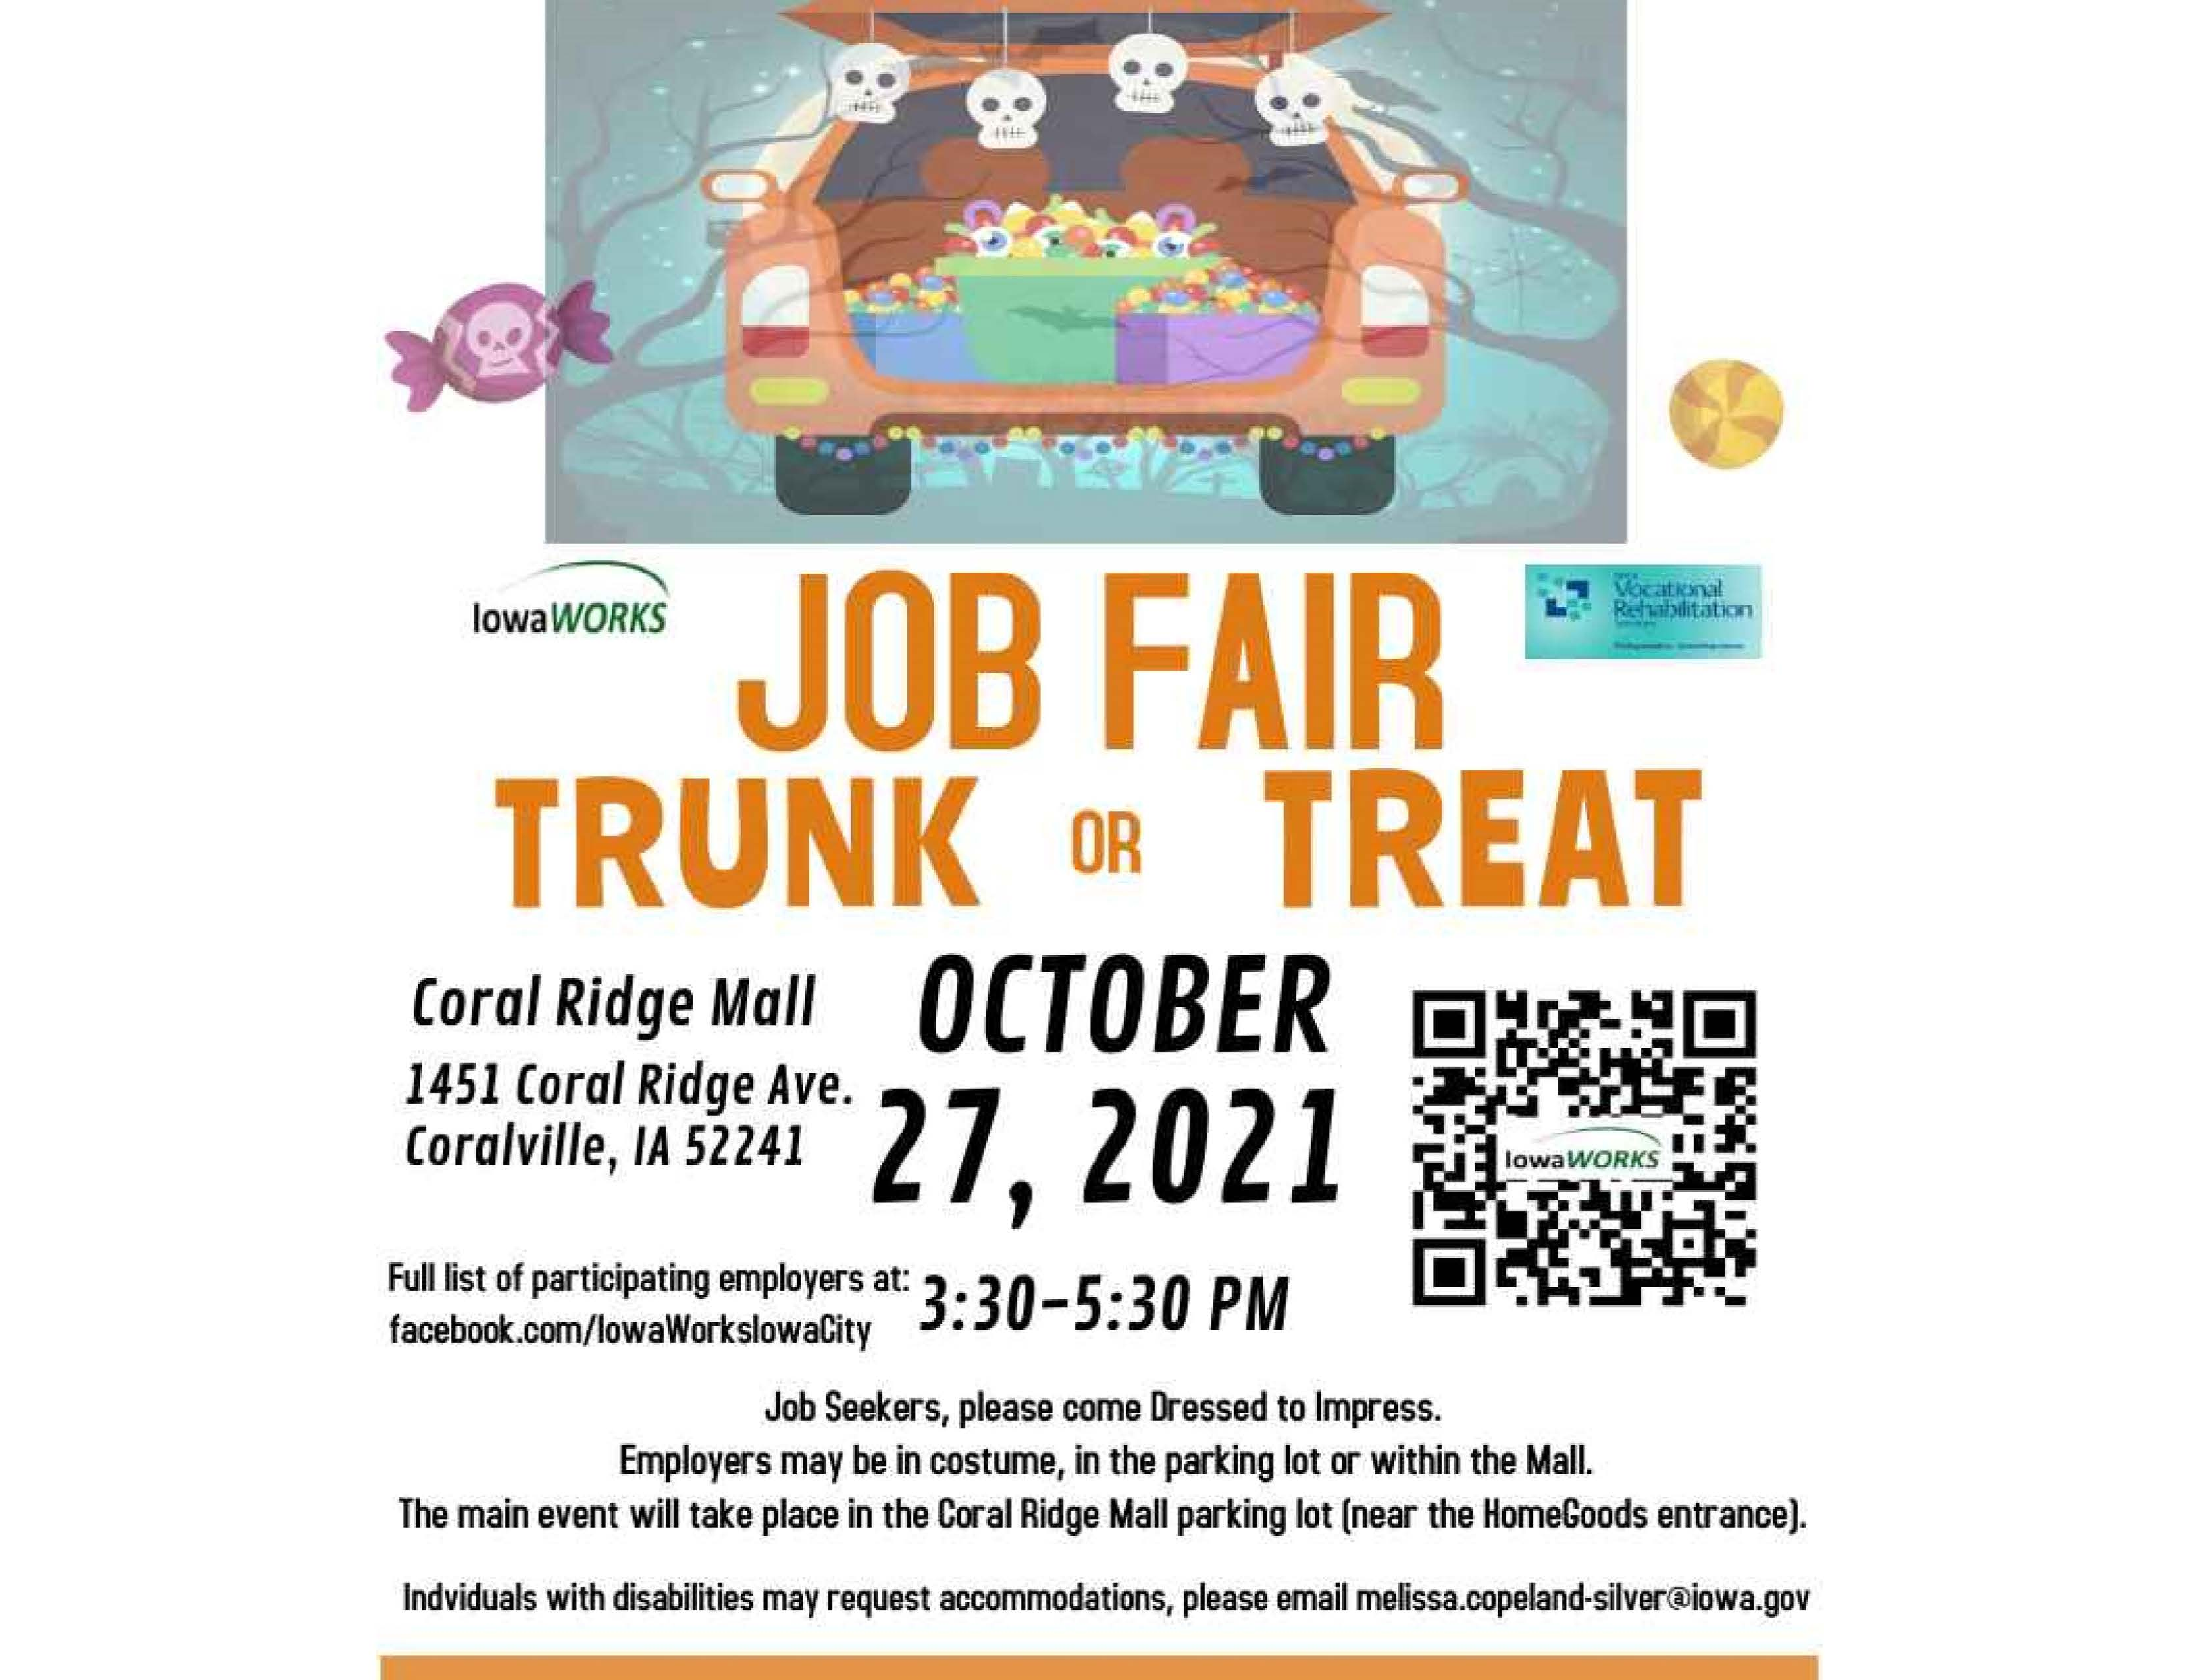 Trunk or Treat Job Fair